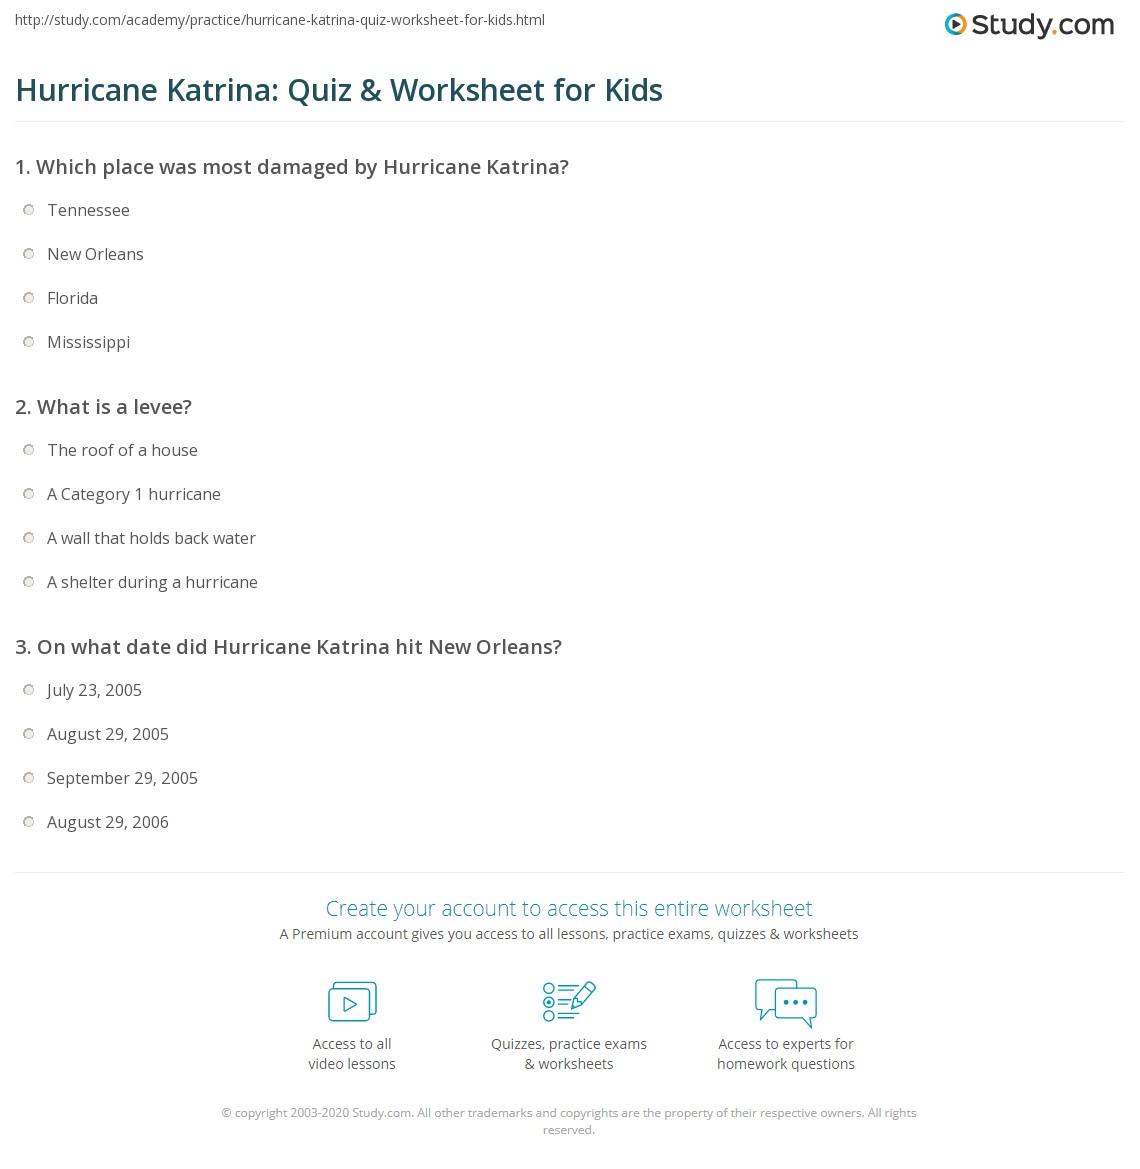 worksheet The Virtual Cell Worksheet hurricane worksheets calleveryonedaveday katrina quiz worksheet for kids study com